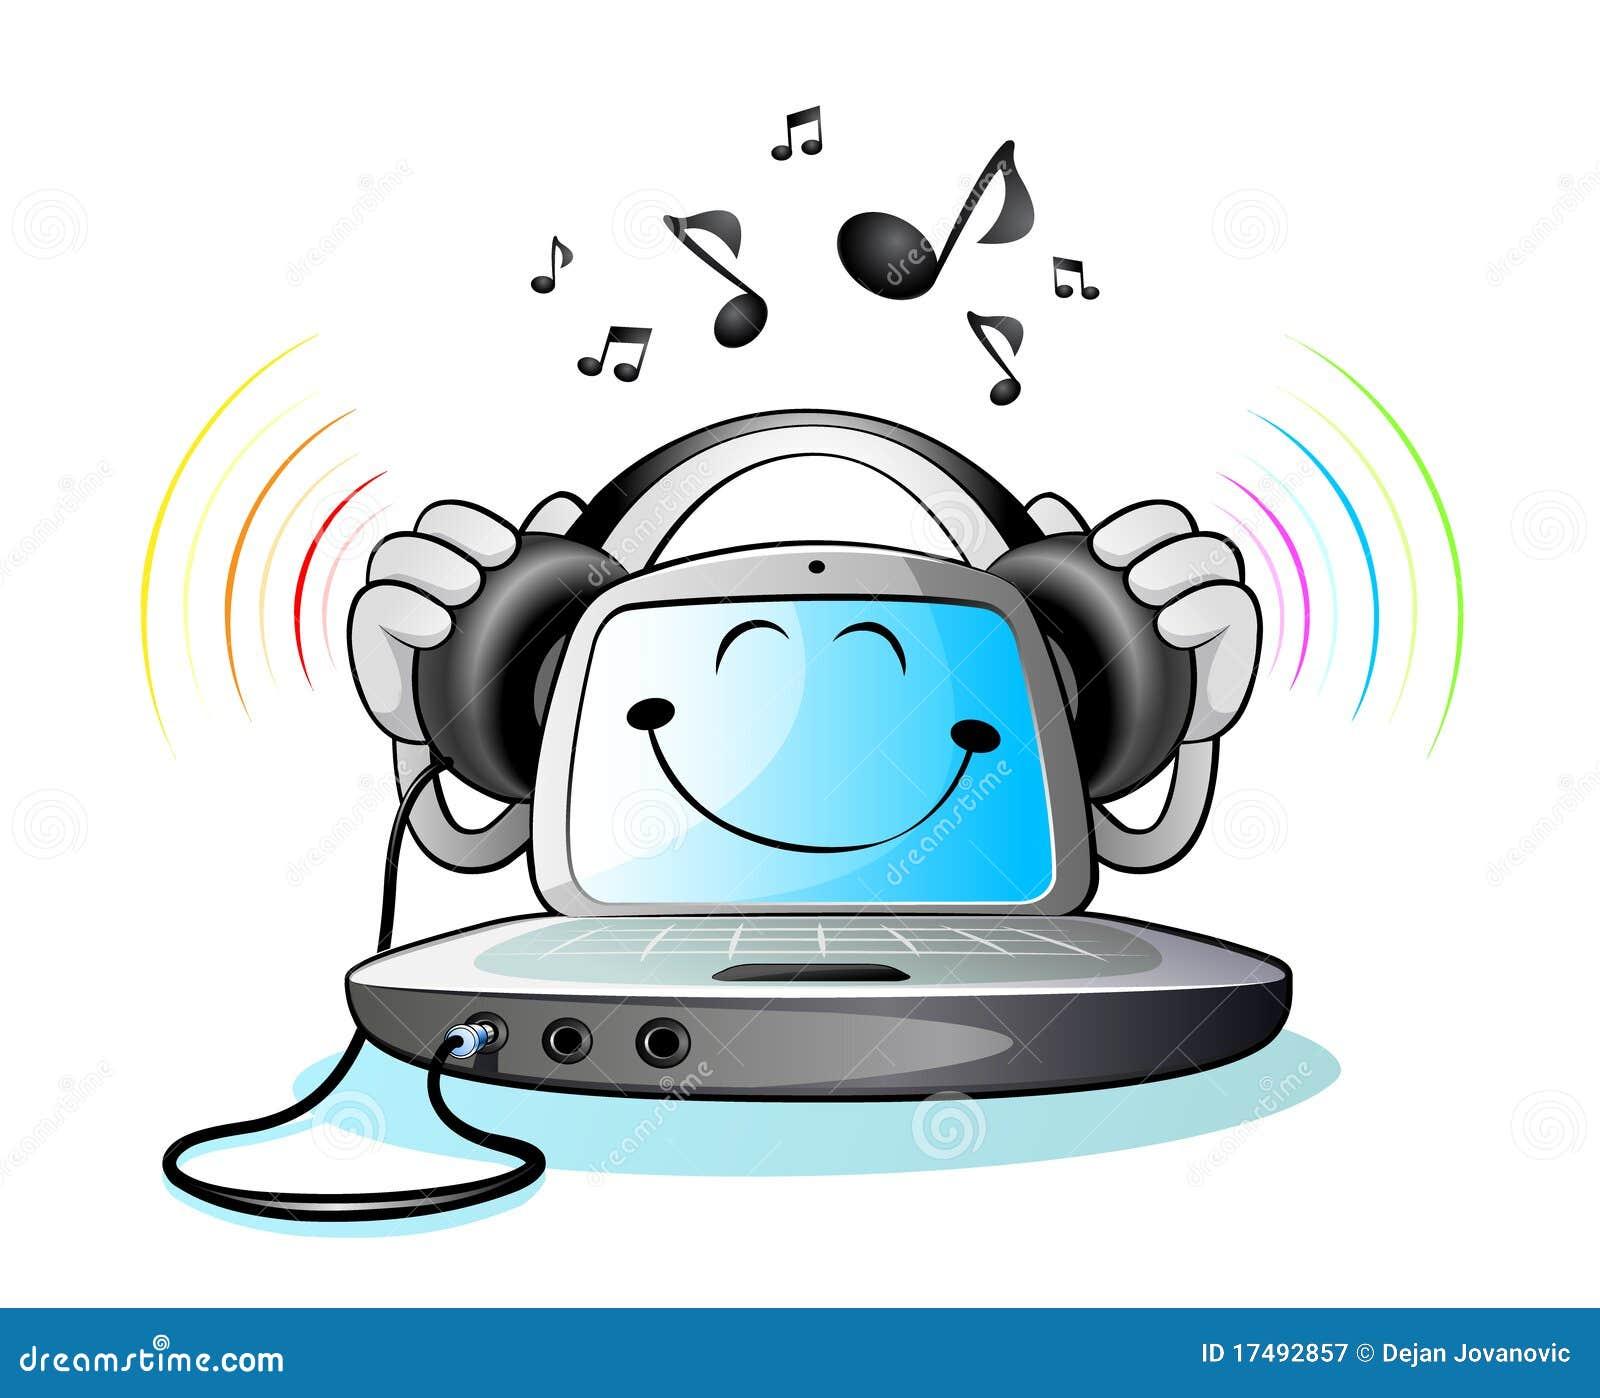 Computer music august 2016 - dba